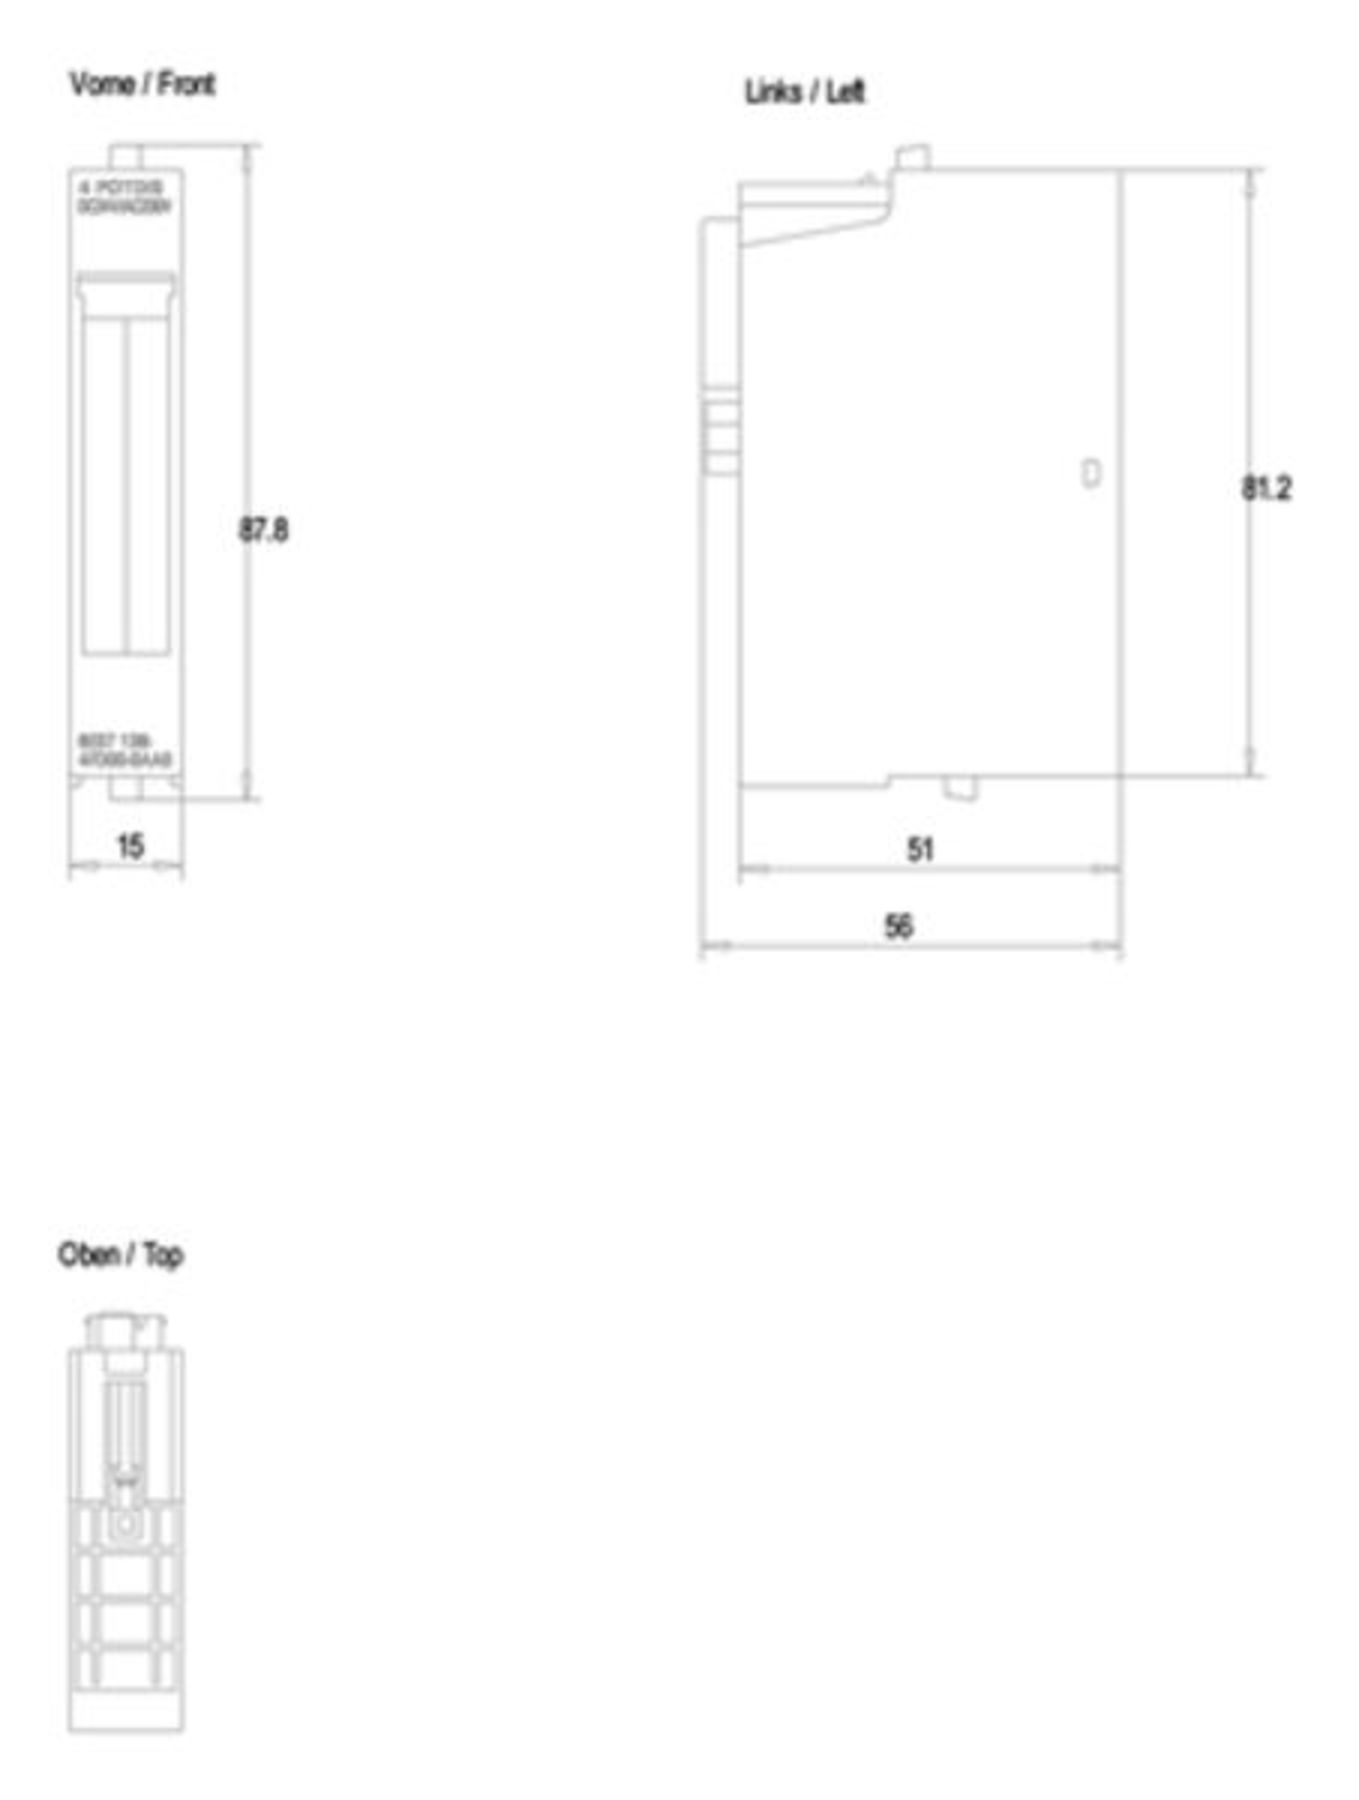 6es7138 4fd00 0aa0 Siemens Potential Distribution Module 6es7138